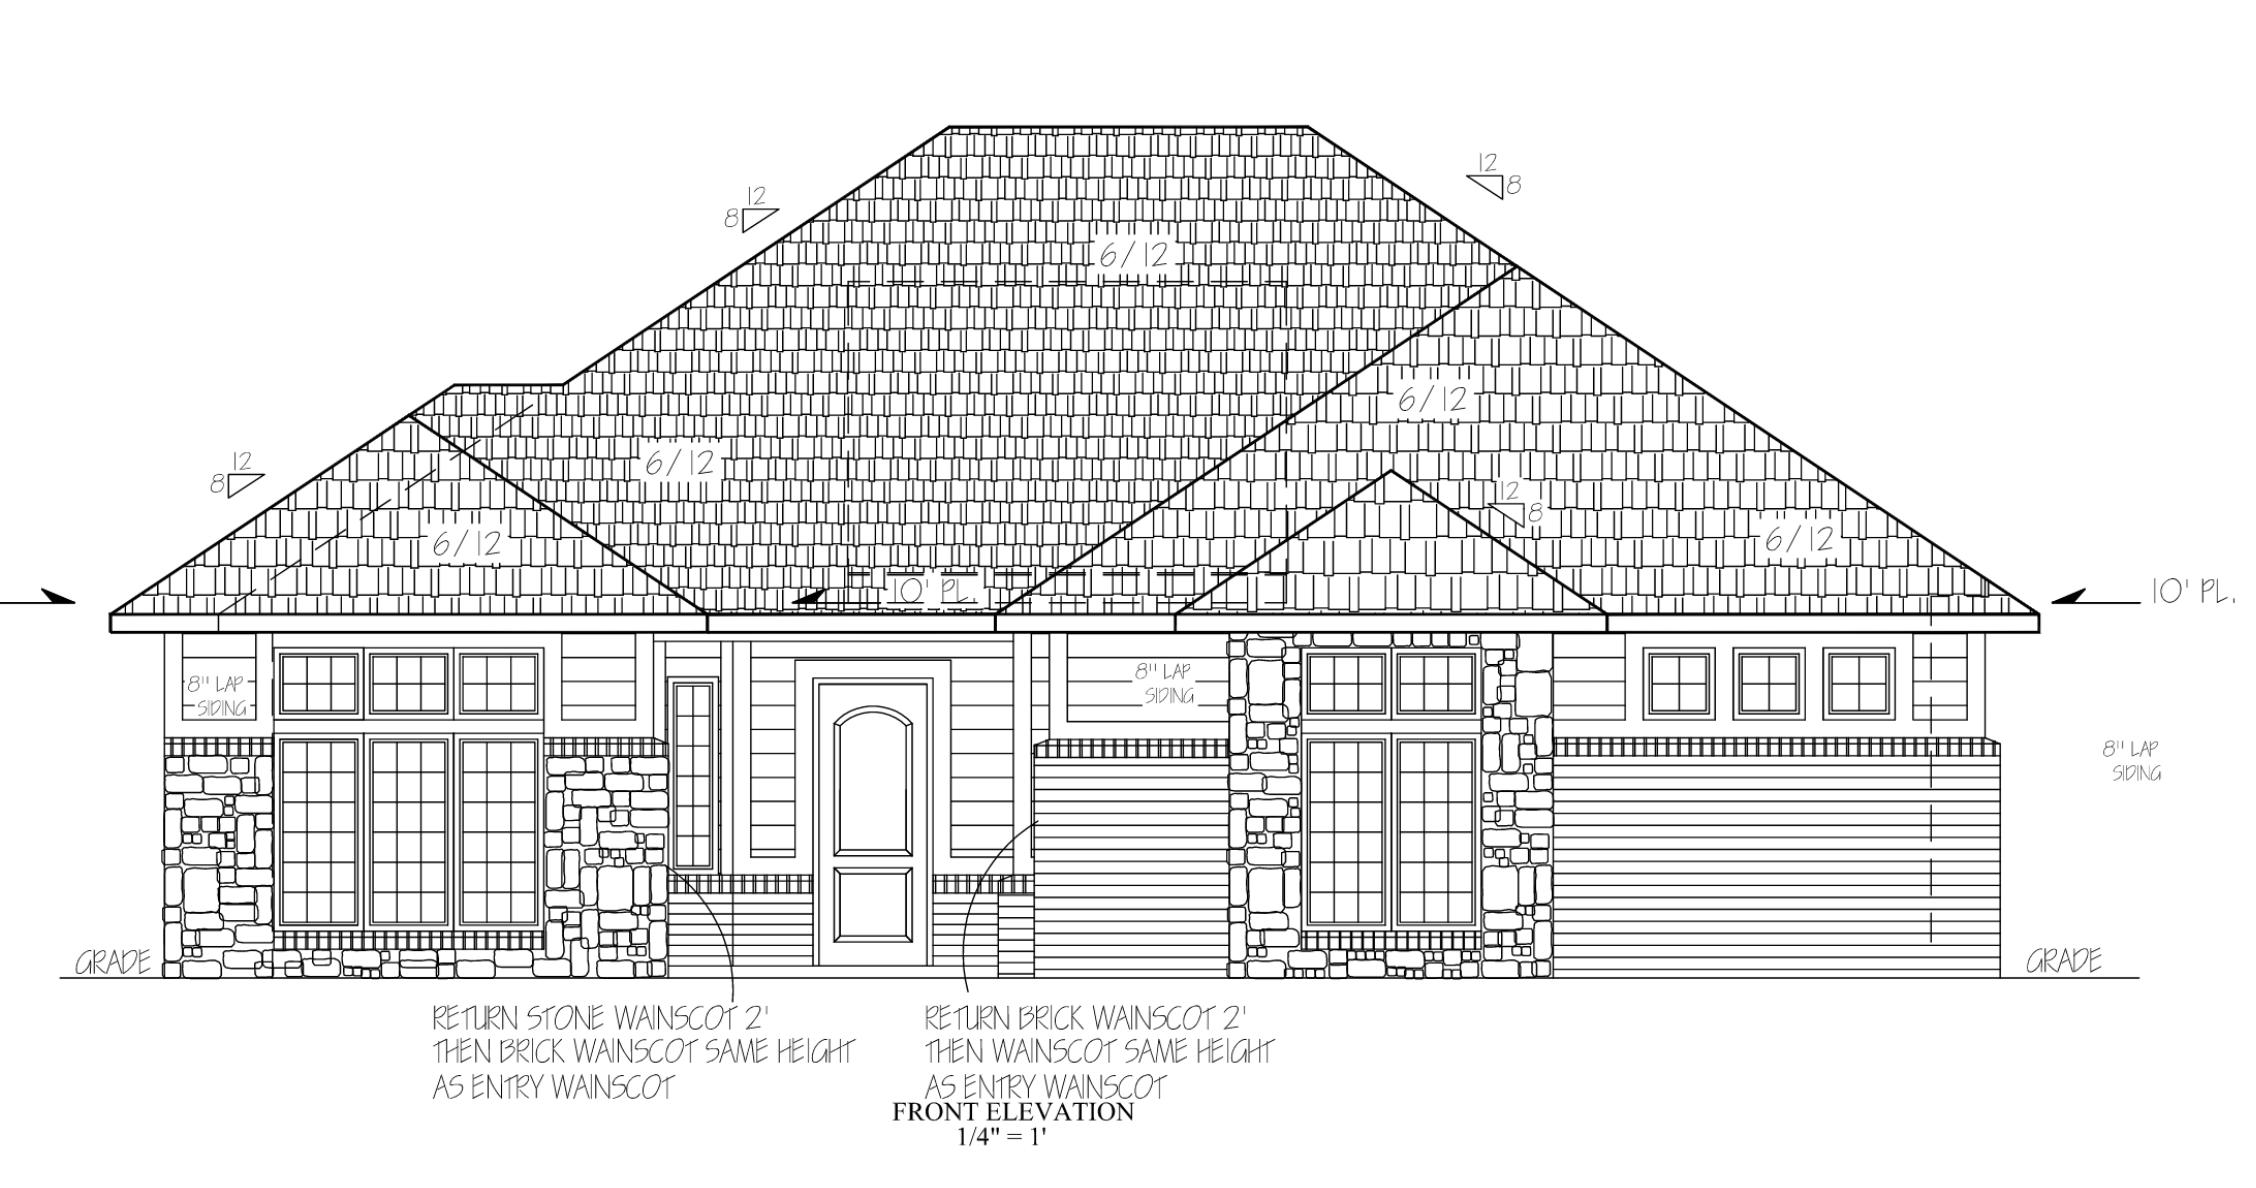 6391 Venice - 3 bedroom, 2 bathroom1865 square feet$325,796